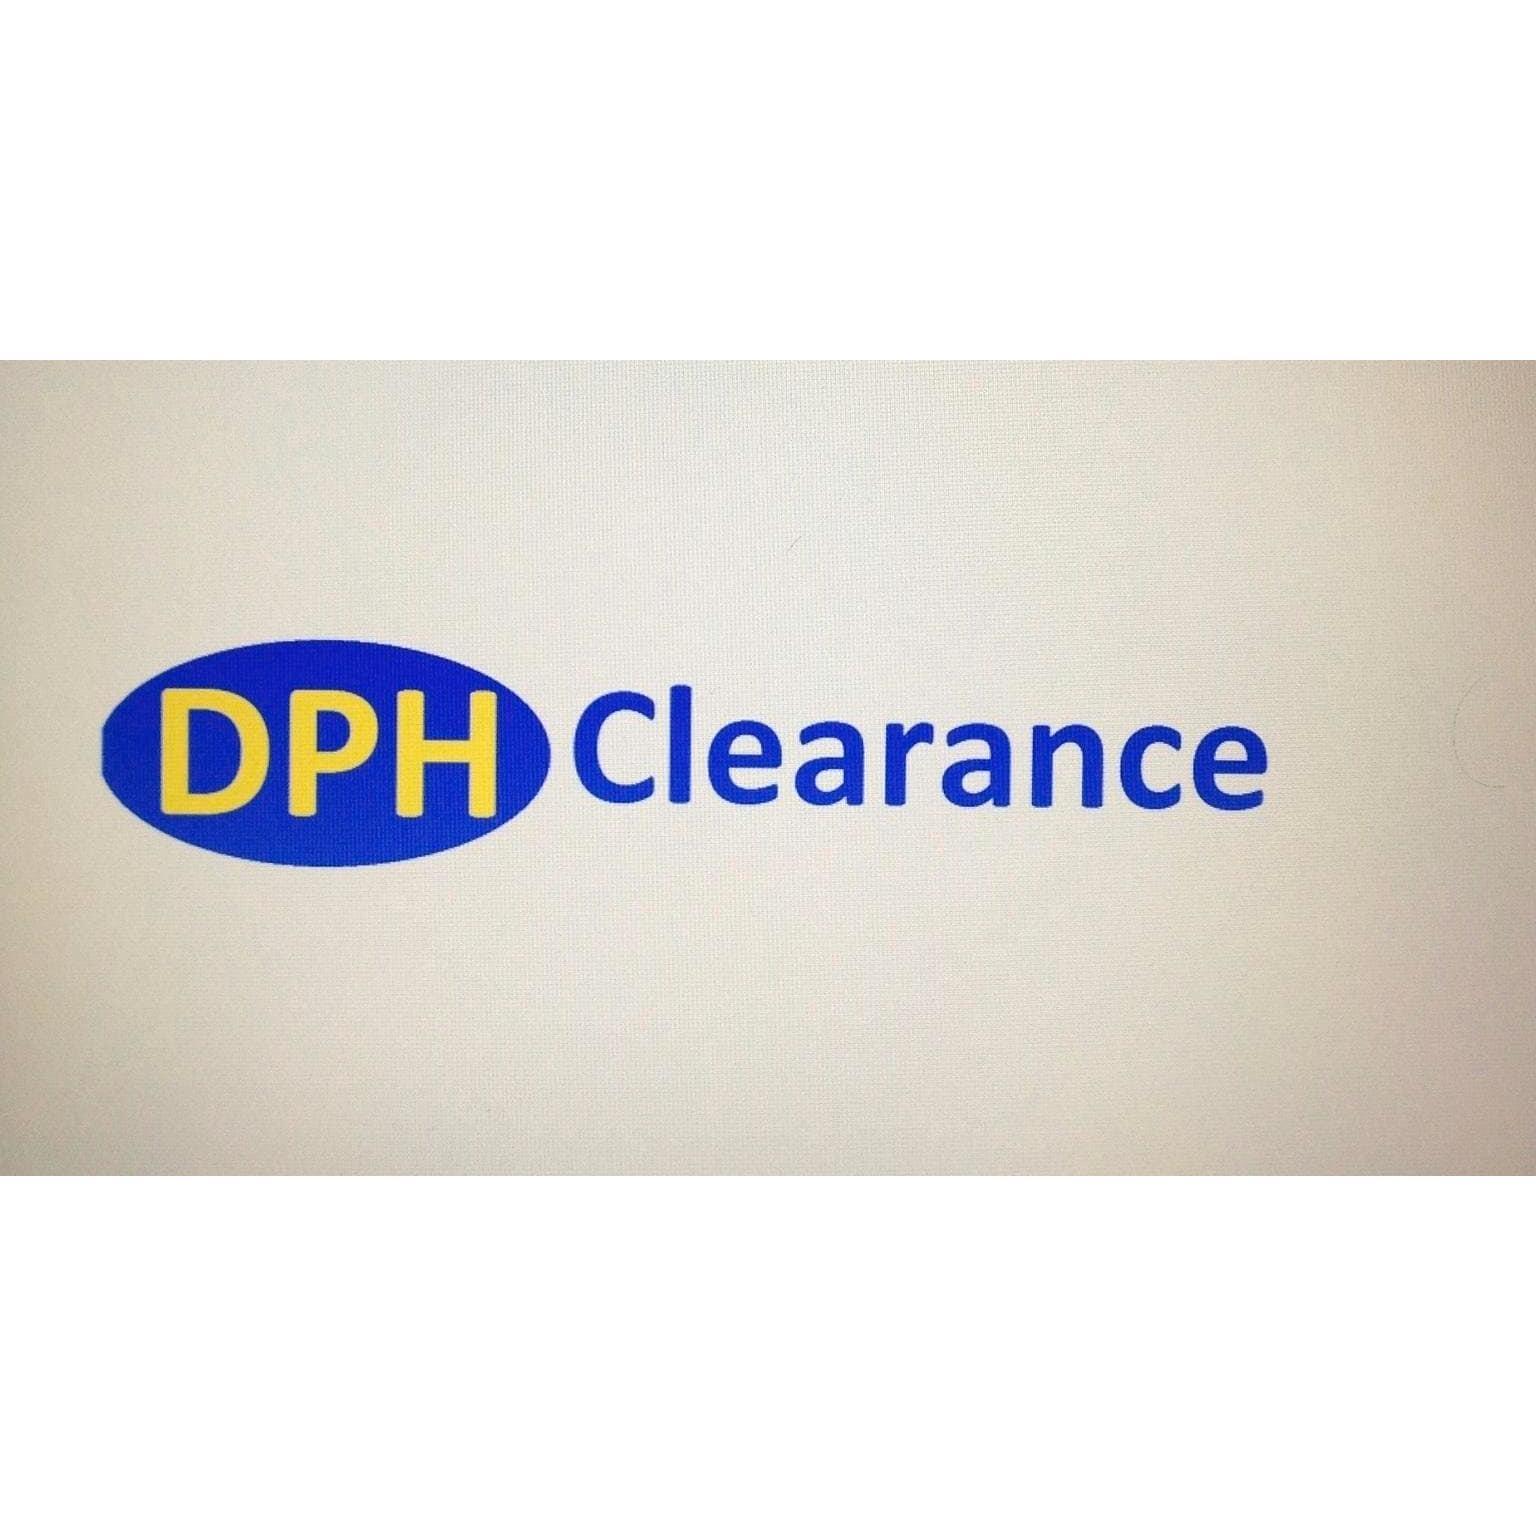 D P H Clearance